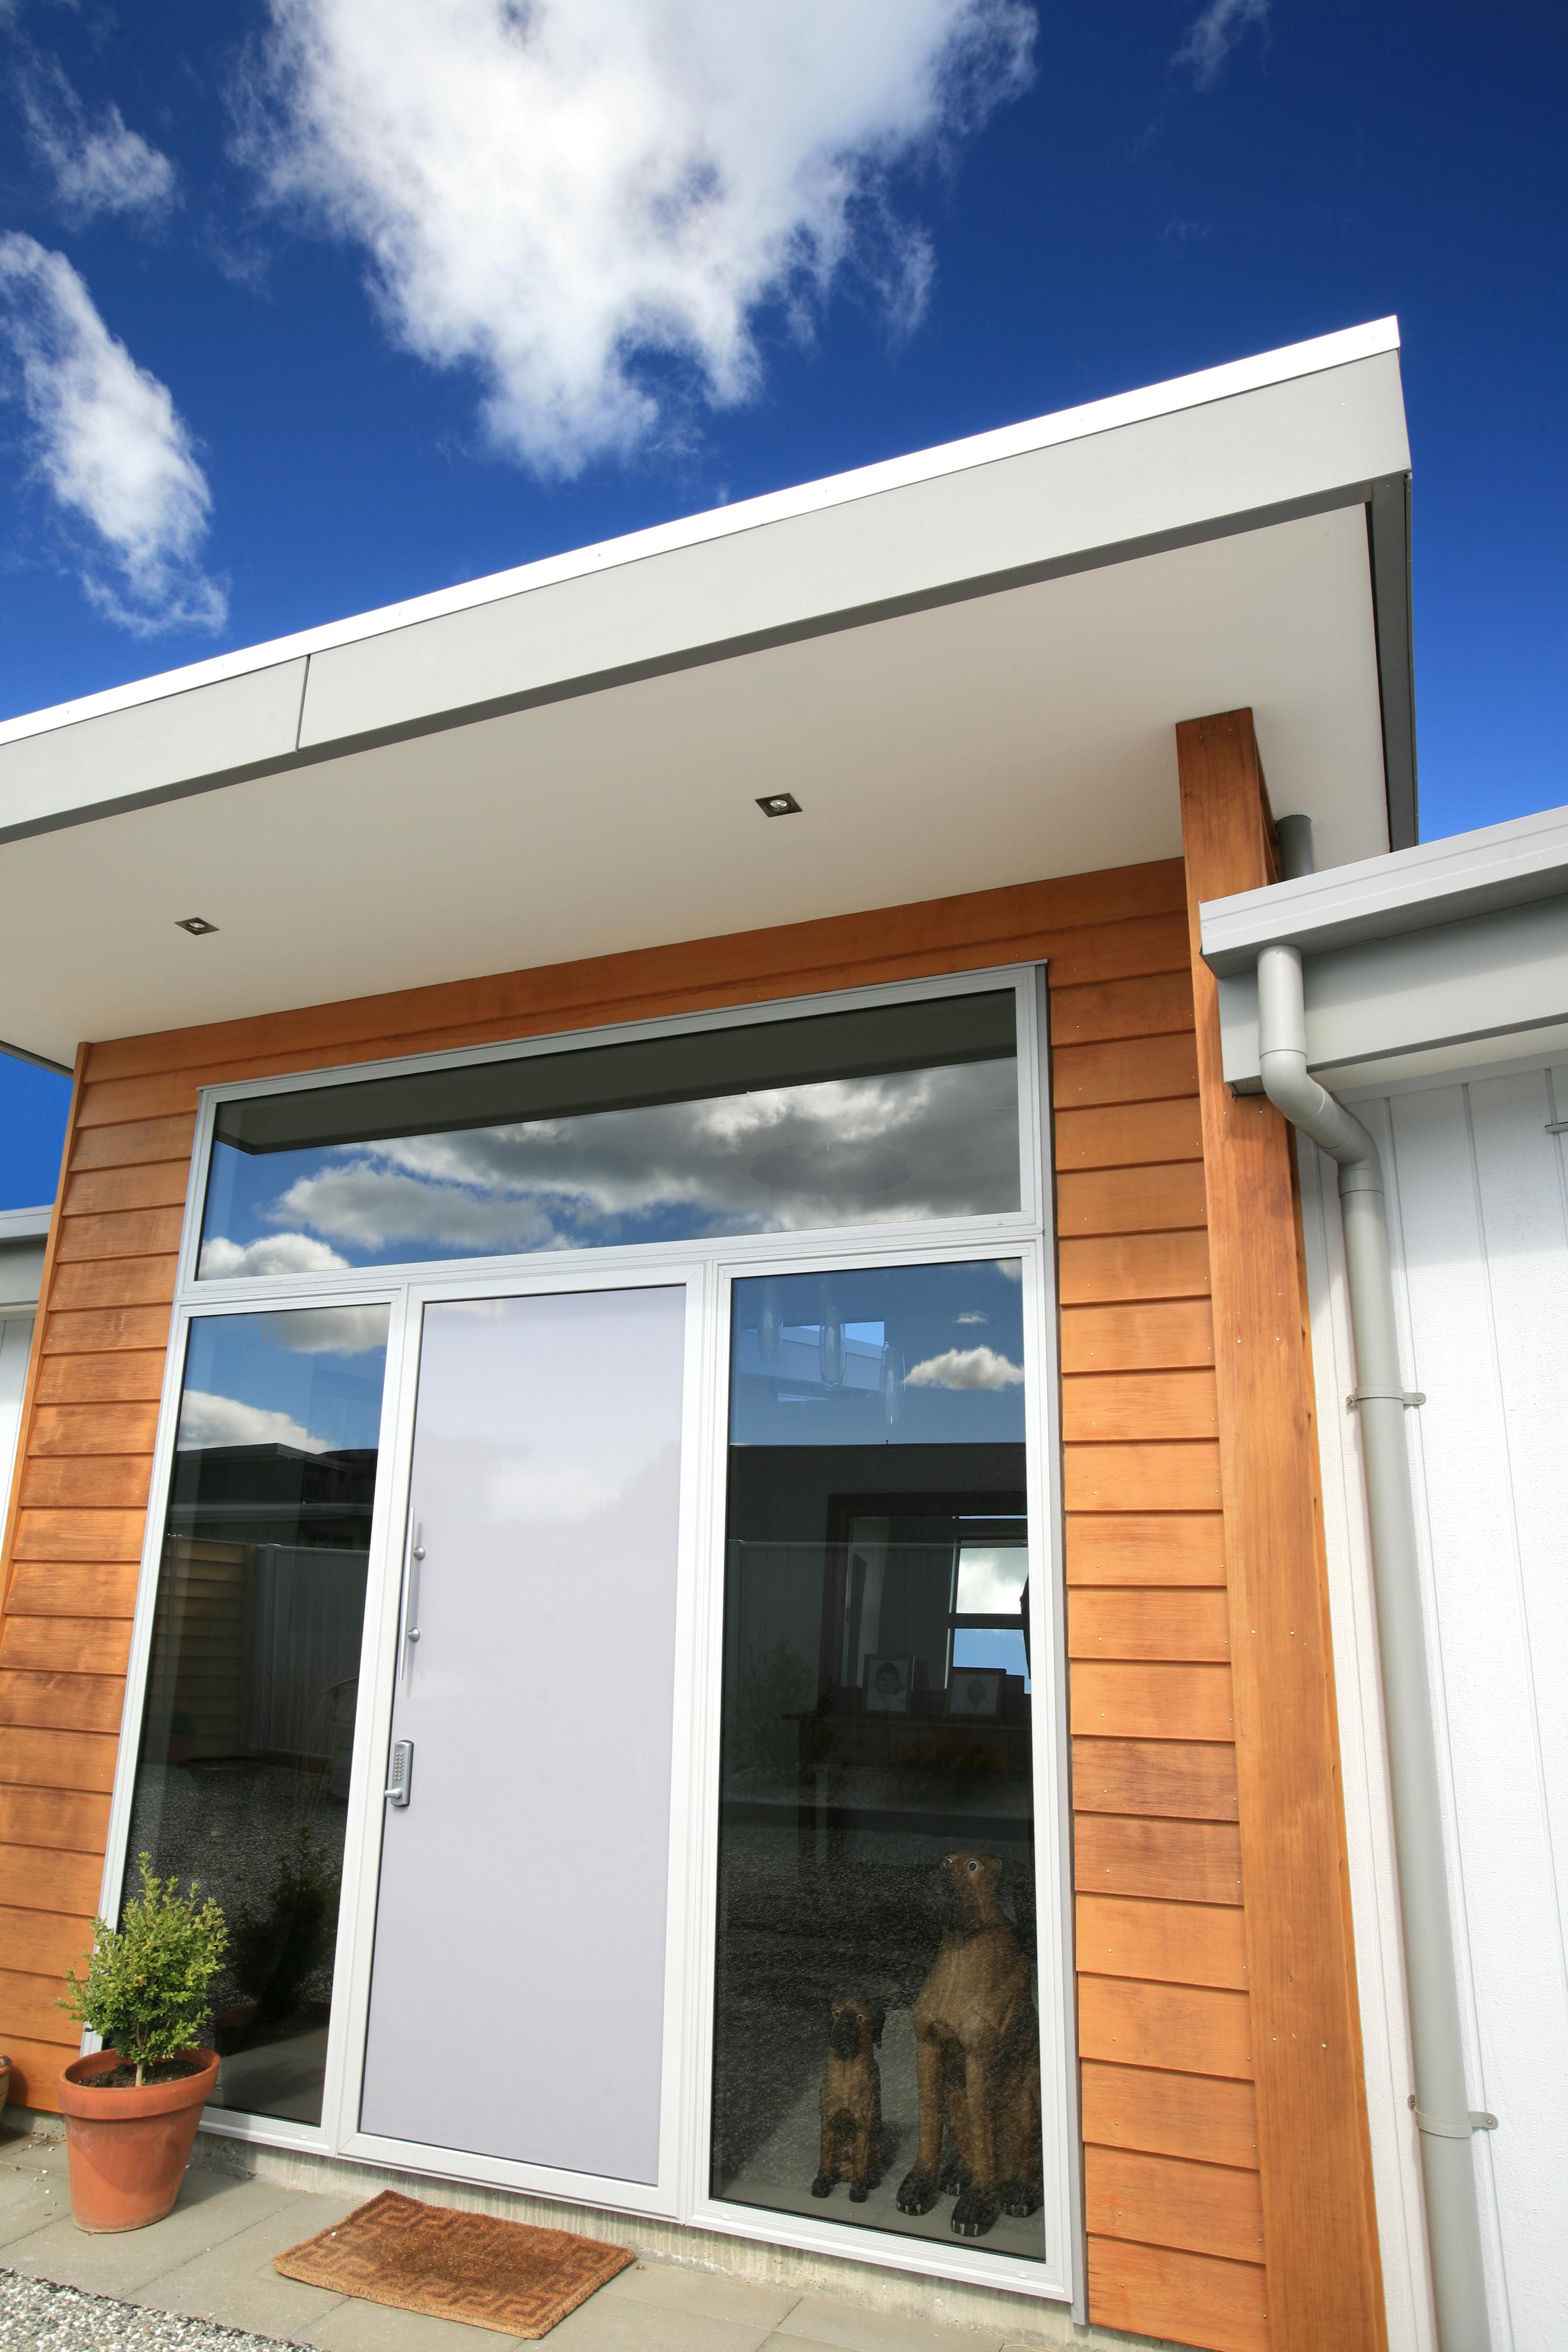 Aluminium Windows and Doors Christchurch New Zealand   Windows ...